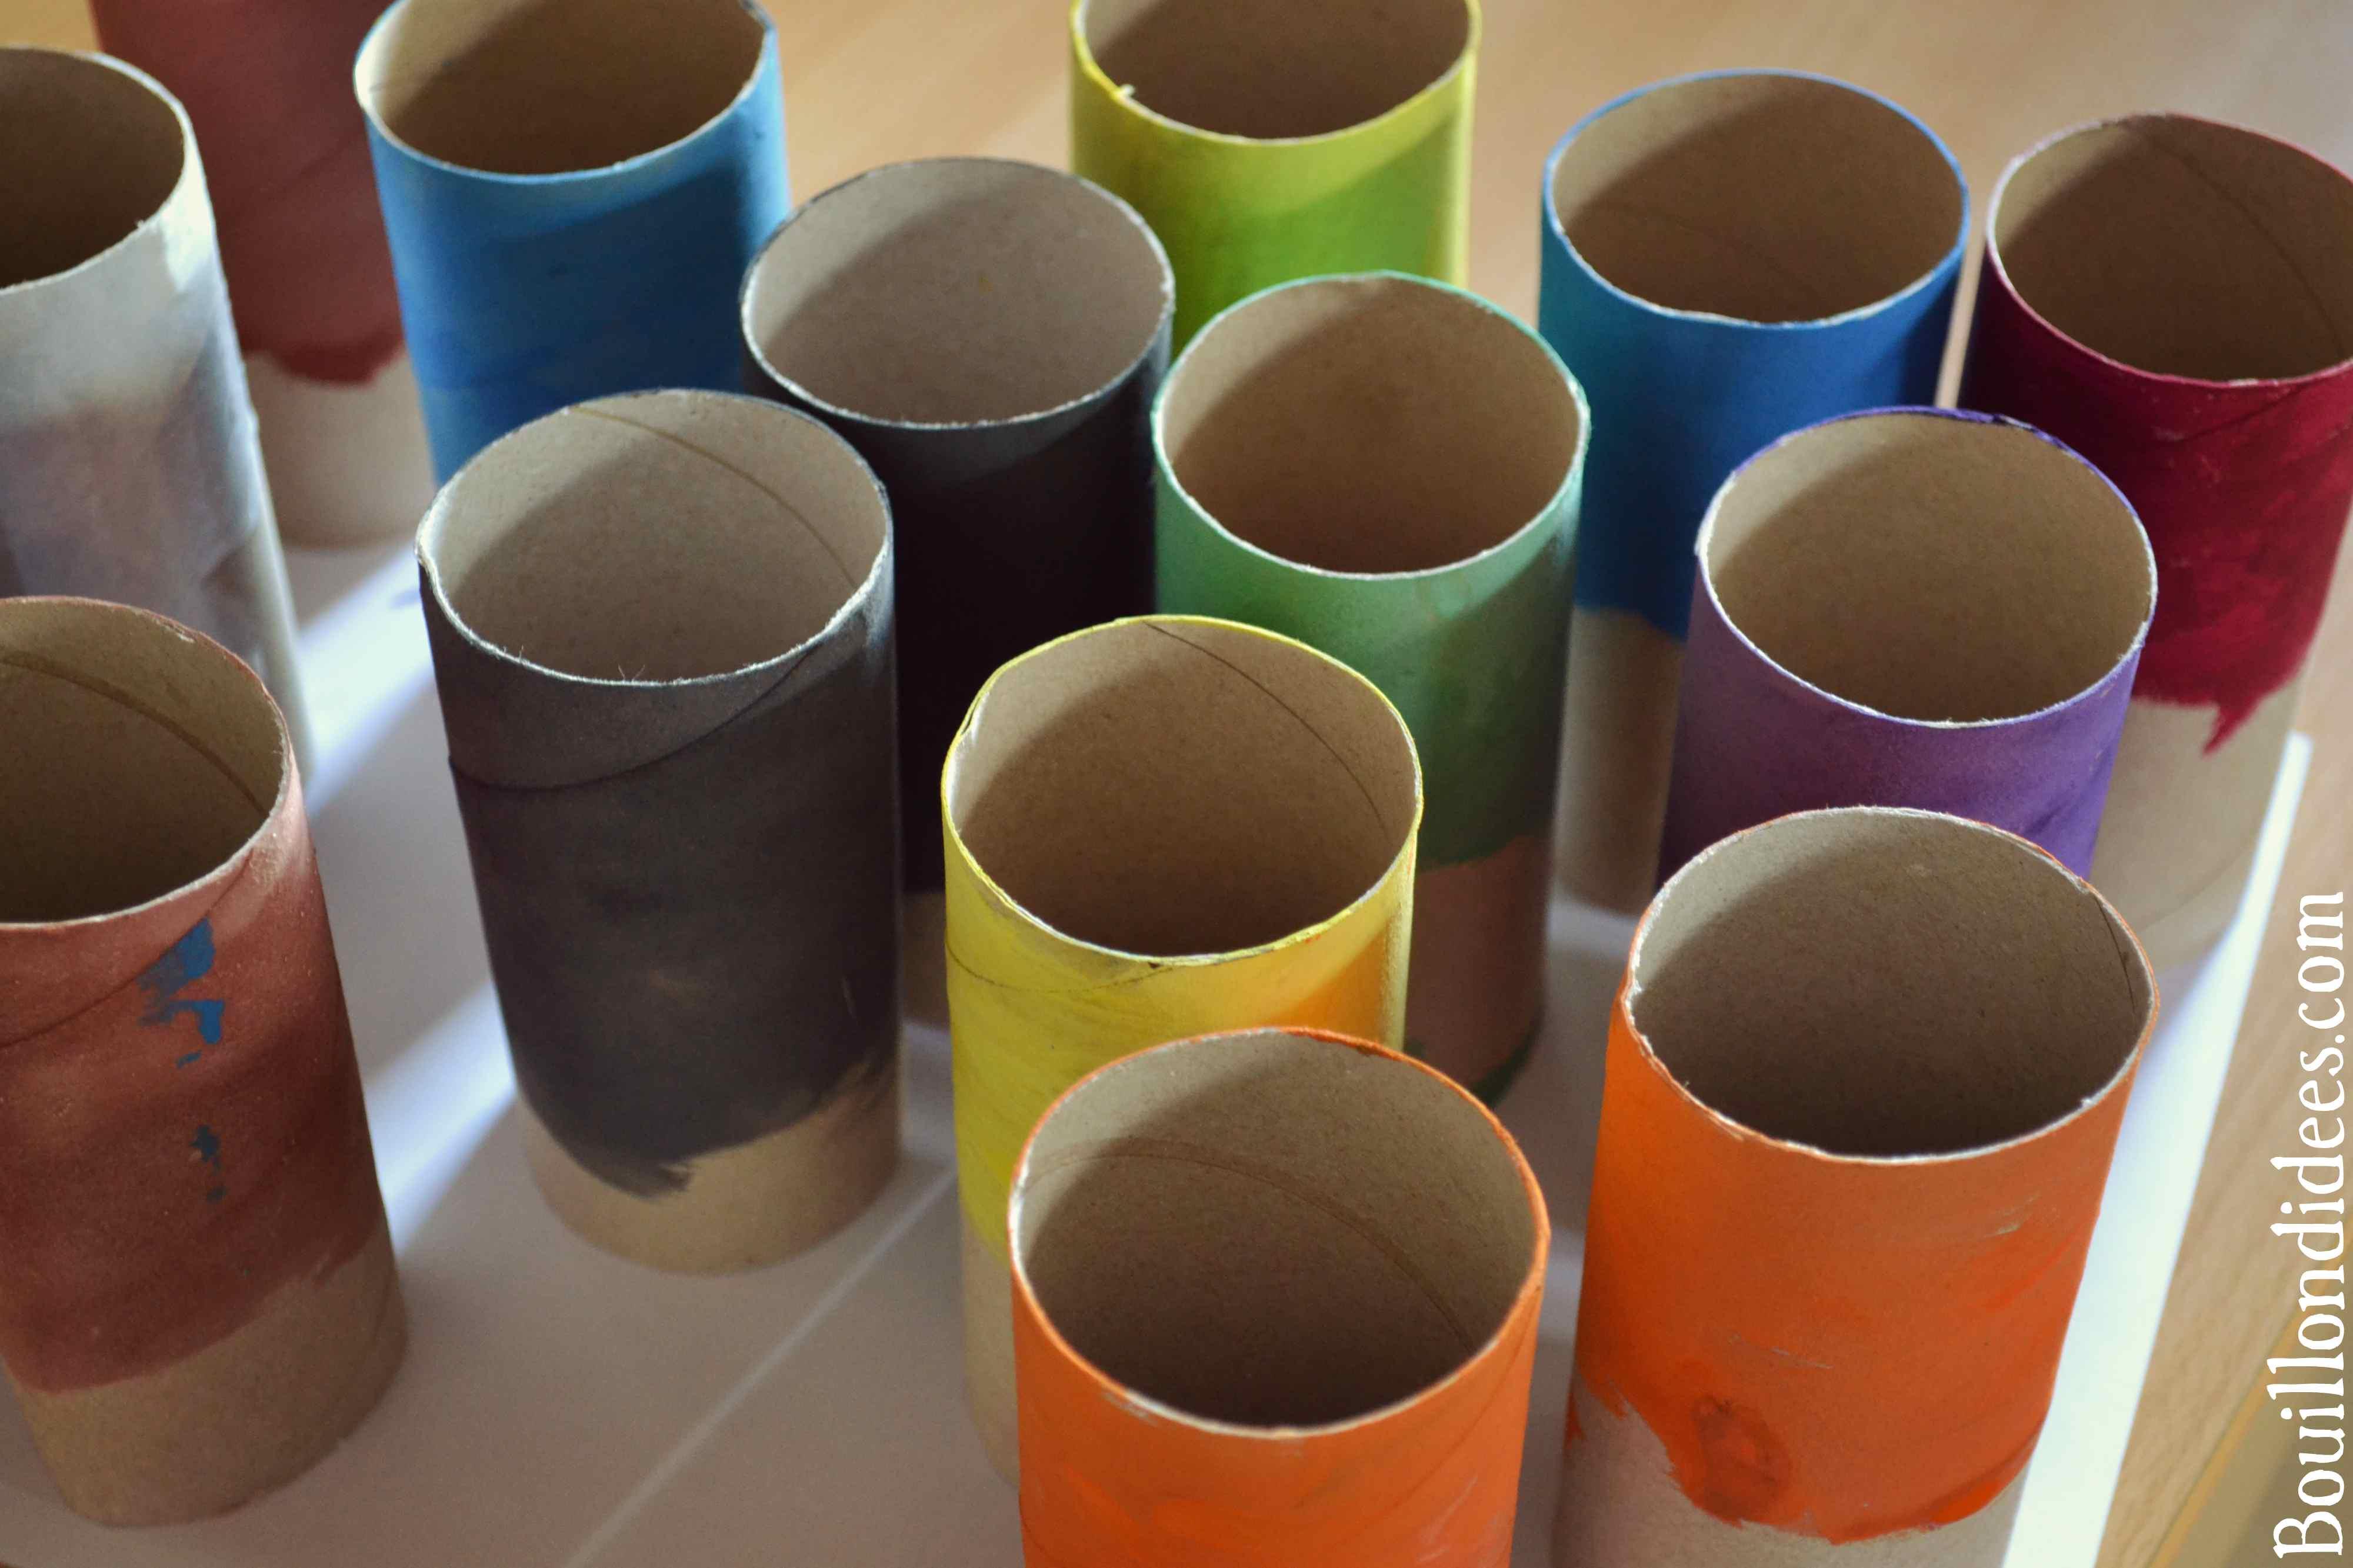 cr er un pot crayons diy rentr e rangement. Black Bedroom Furniture Sets. Home Design Ideas